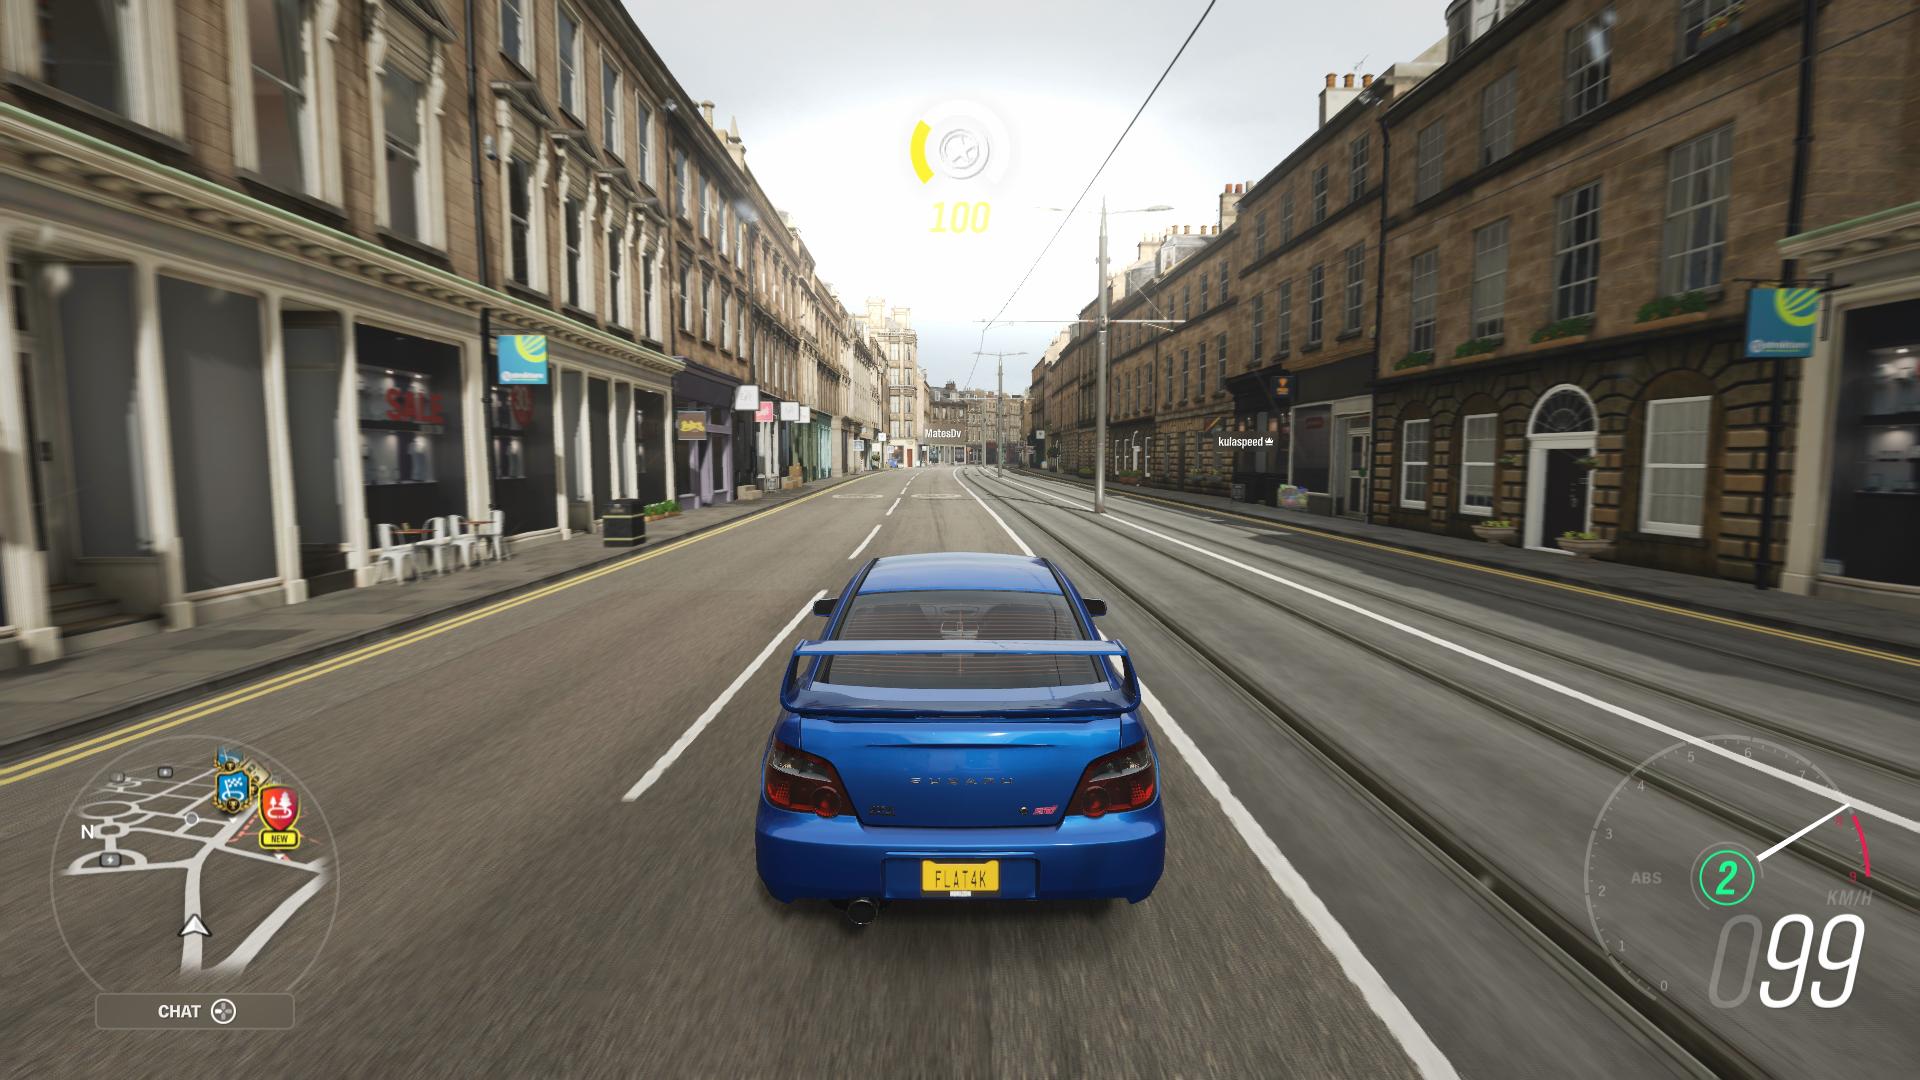 Xbox Series S screenshot of Forza Horizon 4 with a Subaru driving through the city